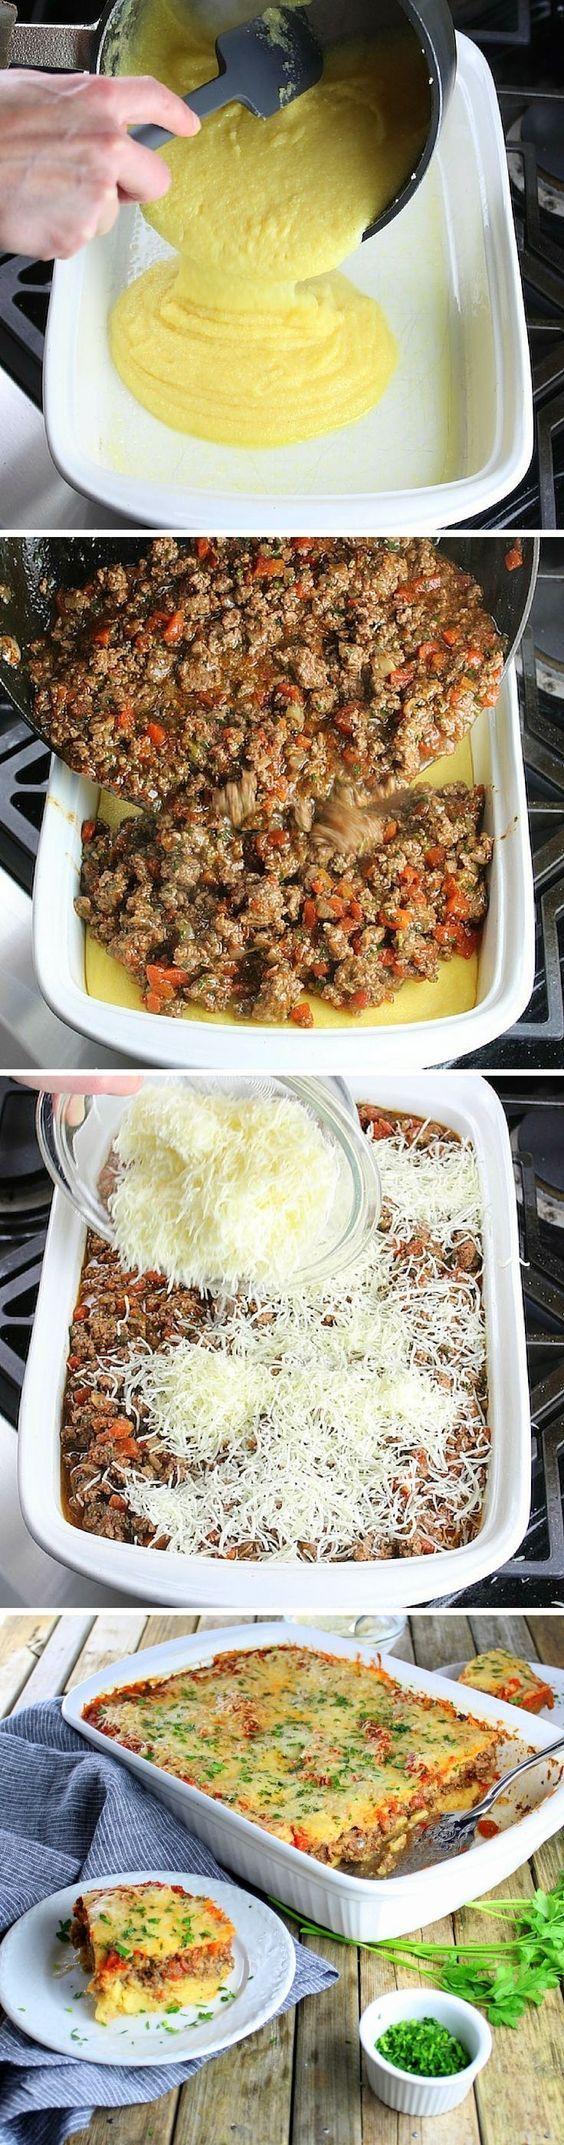 Lamb Lasagna With Parmesan Polenta.  Ground lamb, tomatoes, garlic, & onion... Polenta replaces the #lasagna noodles, making it easy, gluten-free, & delicious!  http://tasteandsee.com